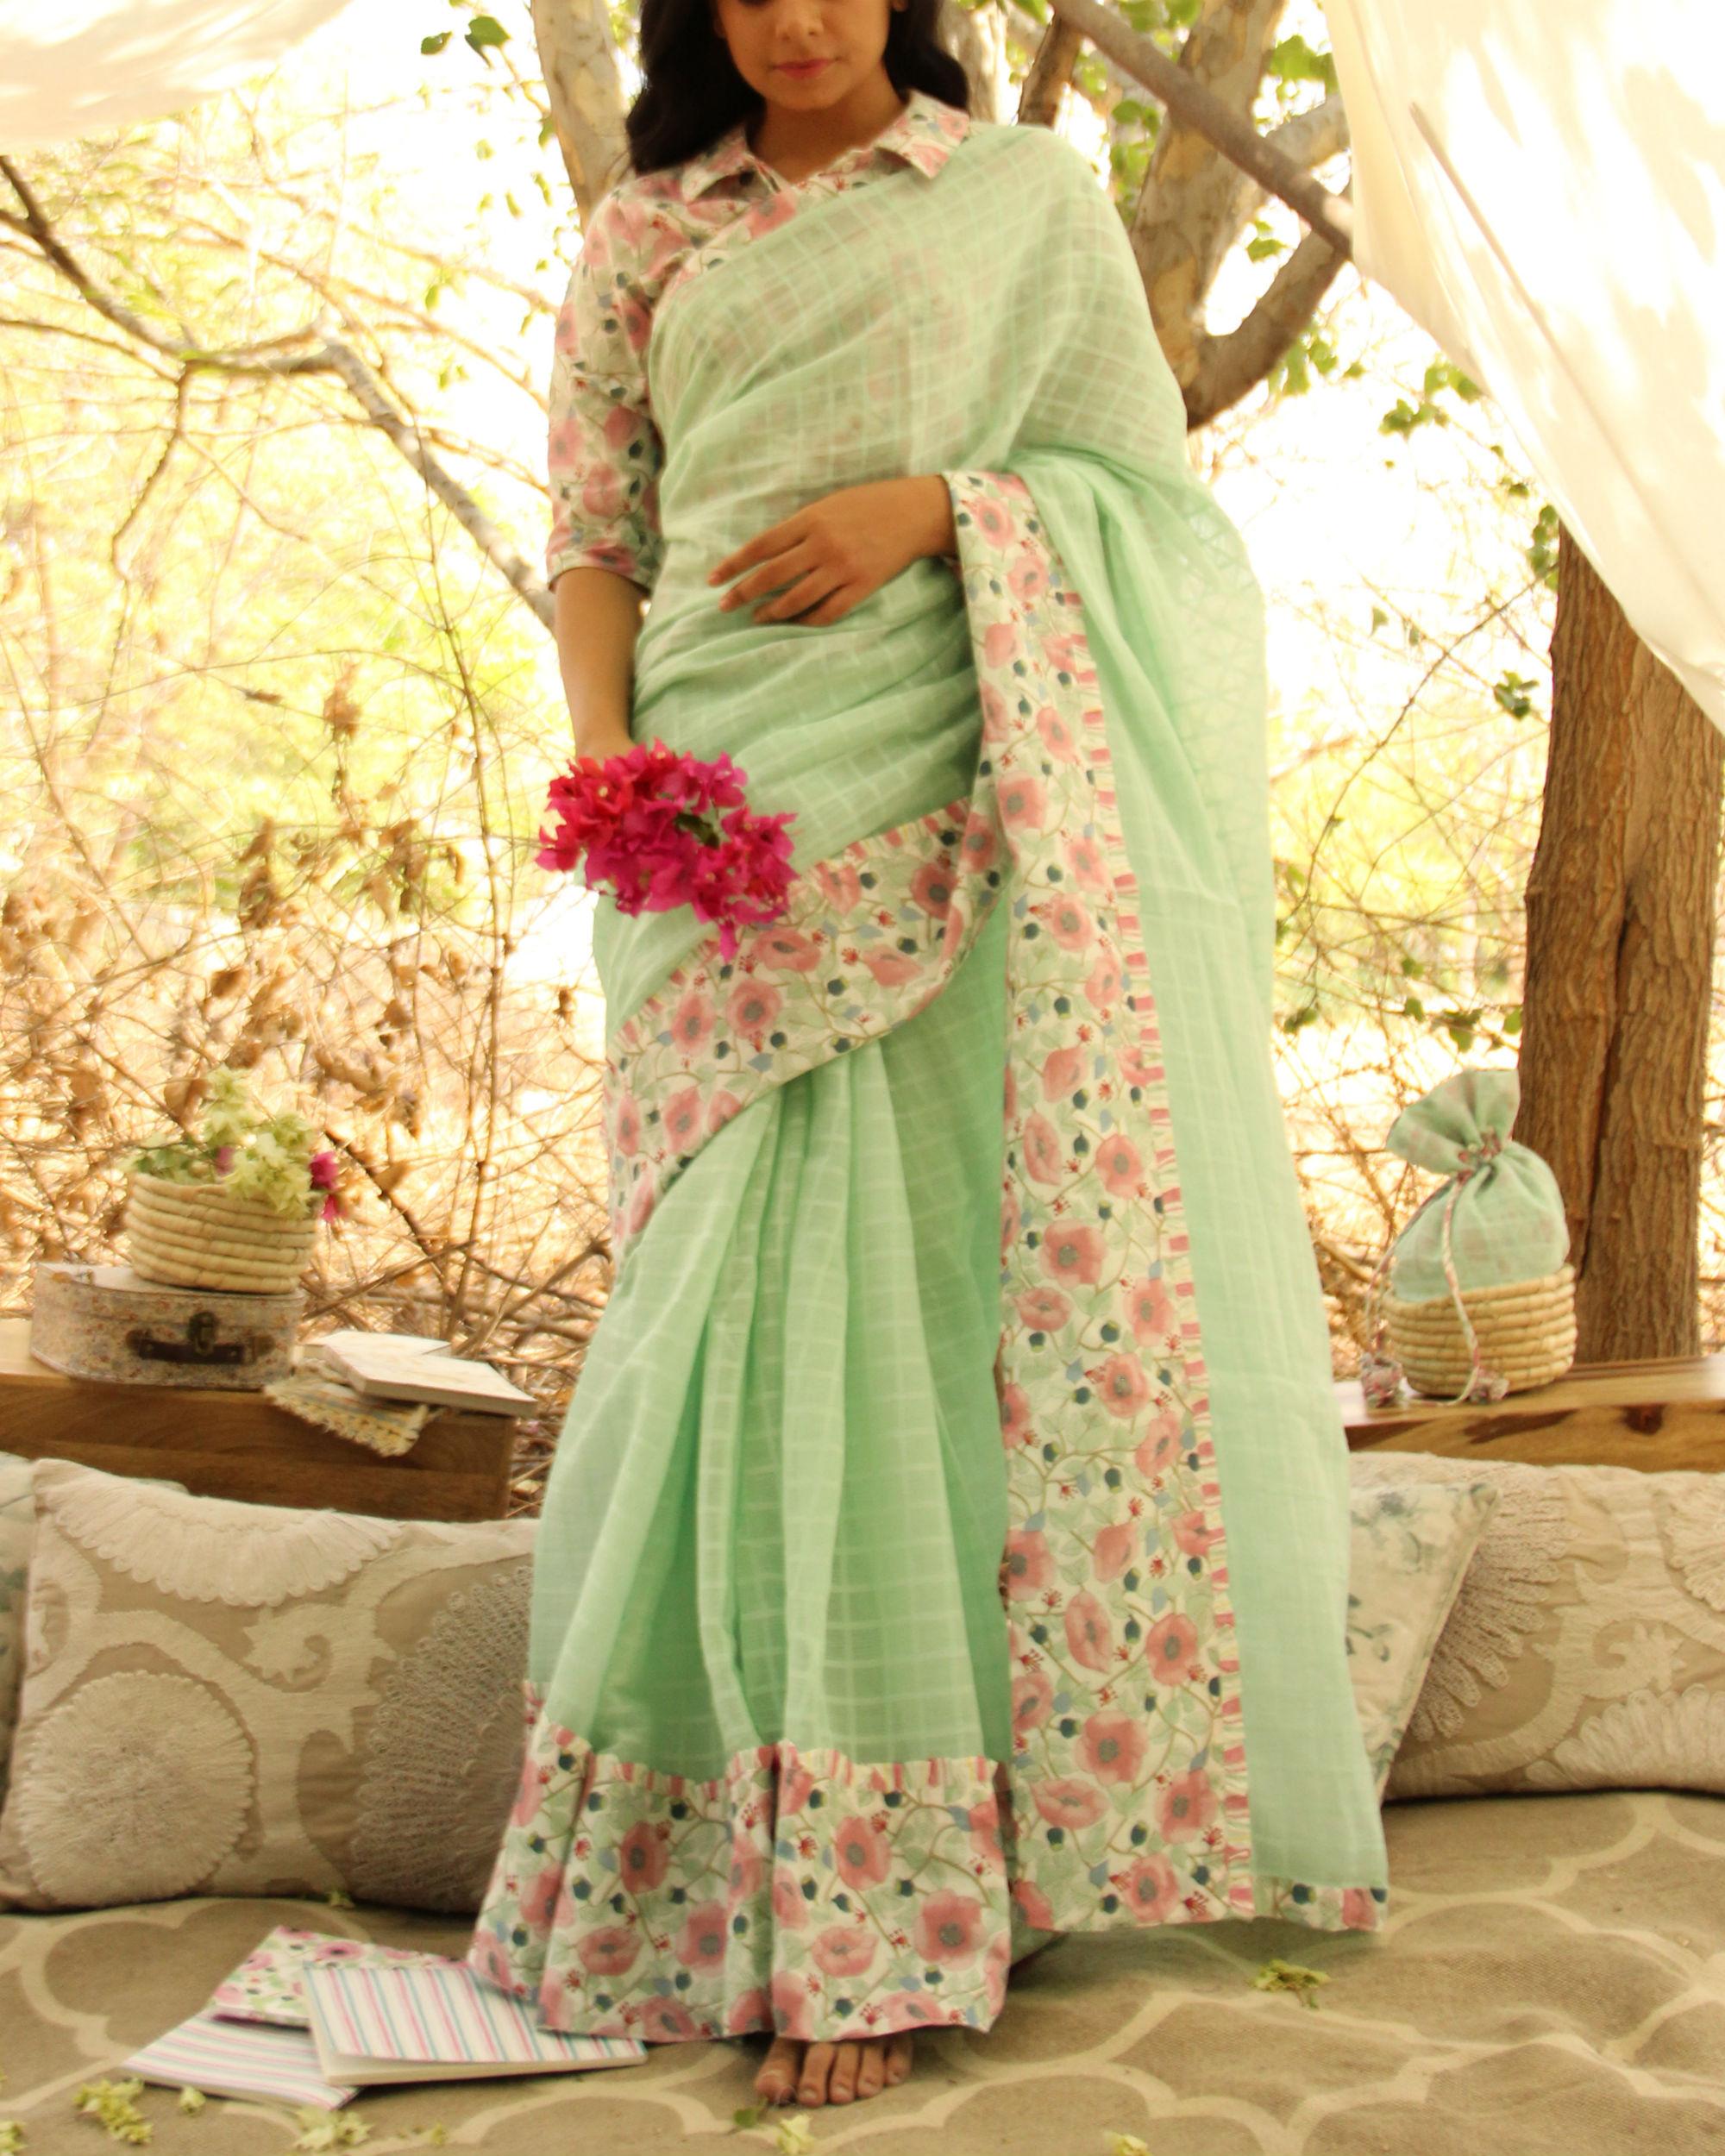 Floral Mint Sari